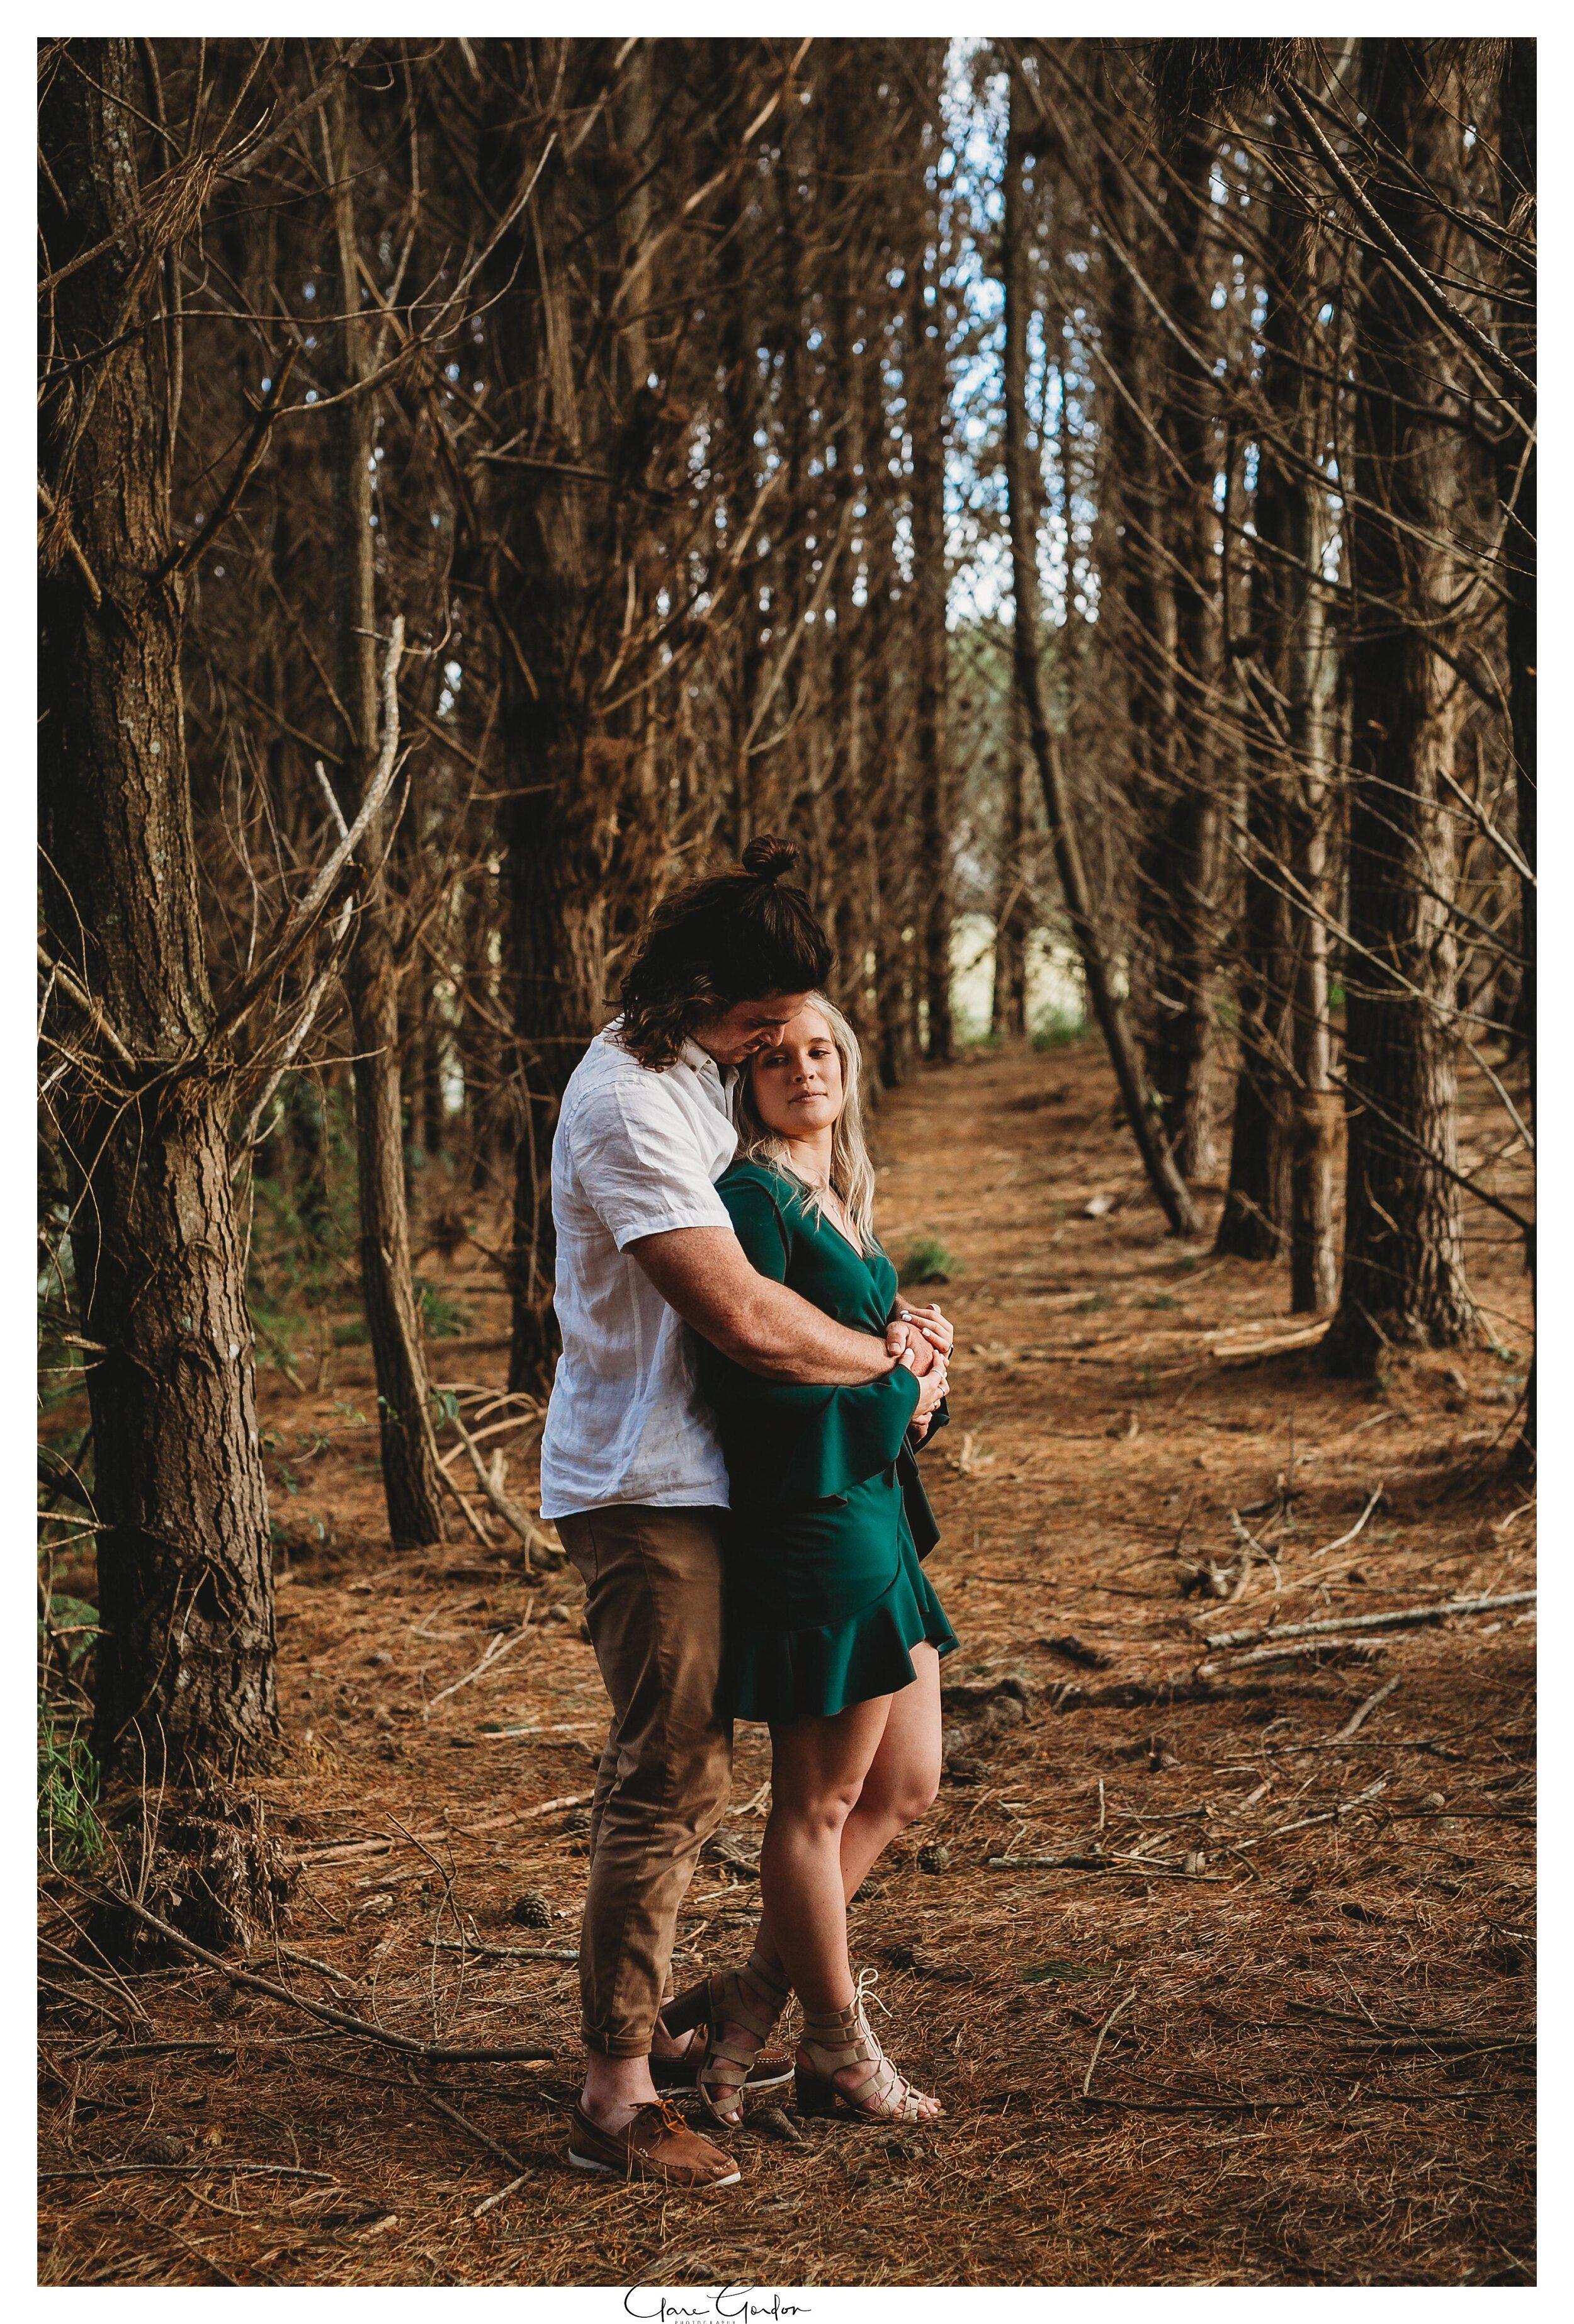 Waikato-engagement-photo-TeMiro-couple-hugging-in-forest-Newzealand-wedding-photographer (11).jpg